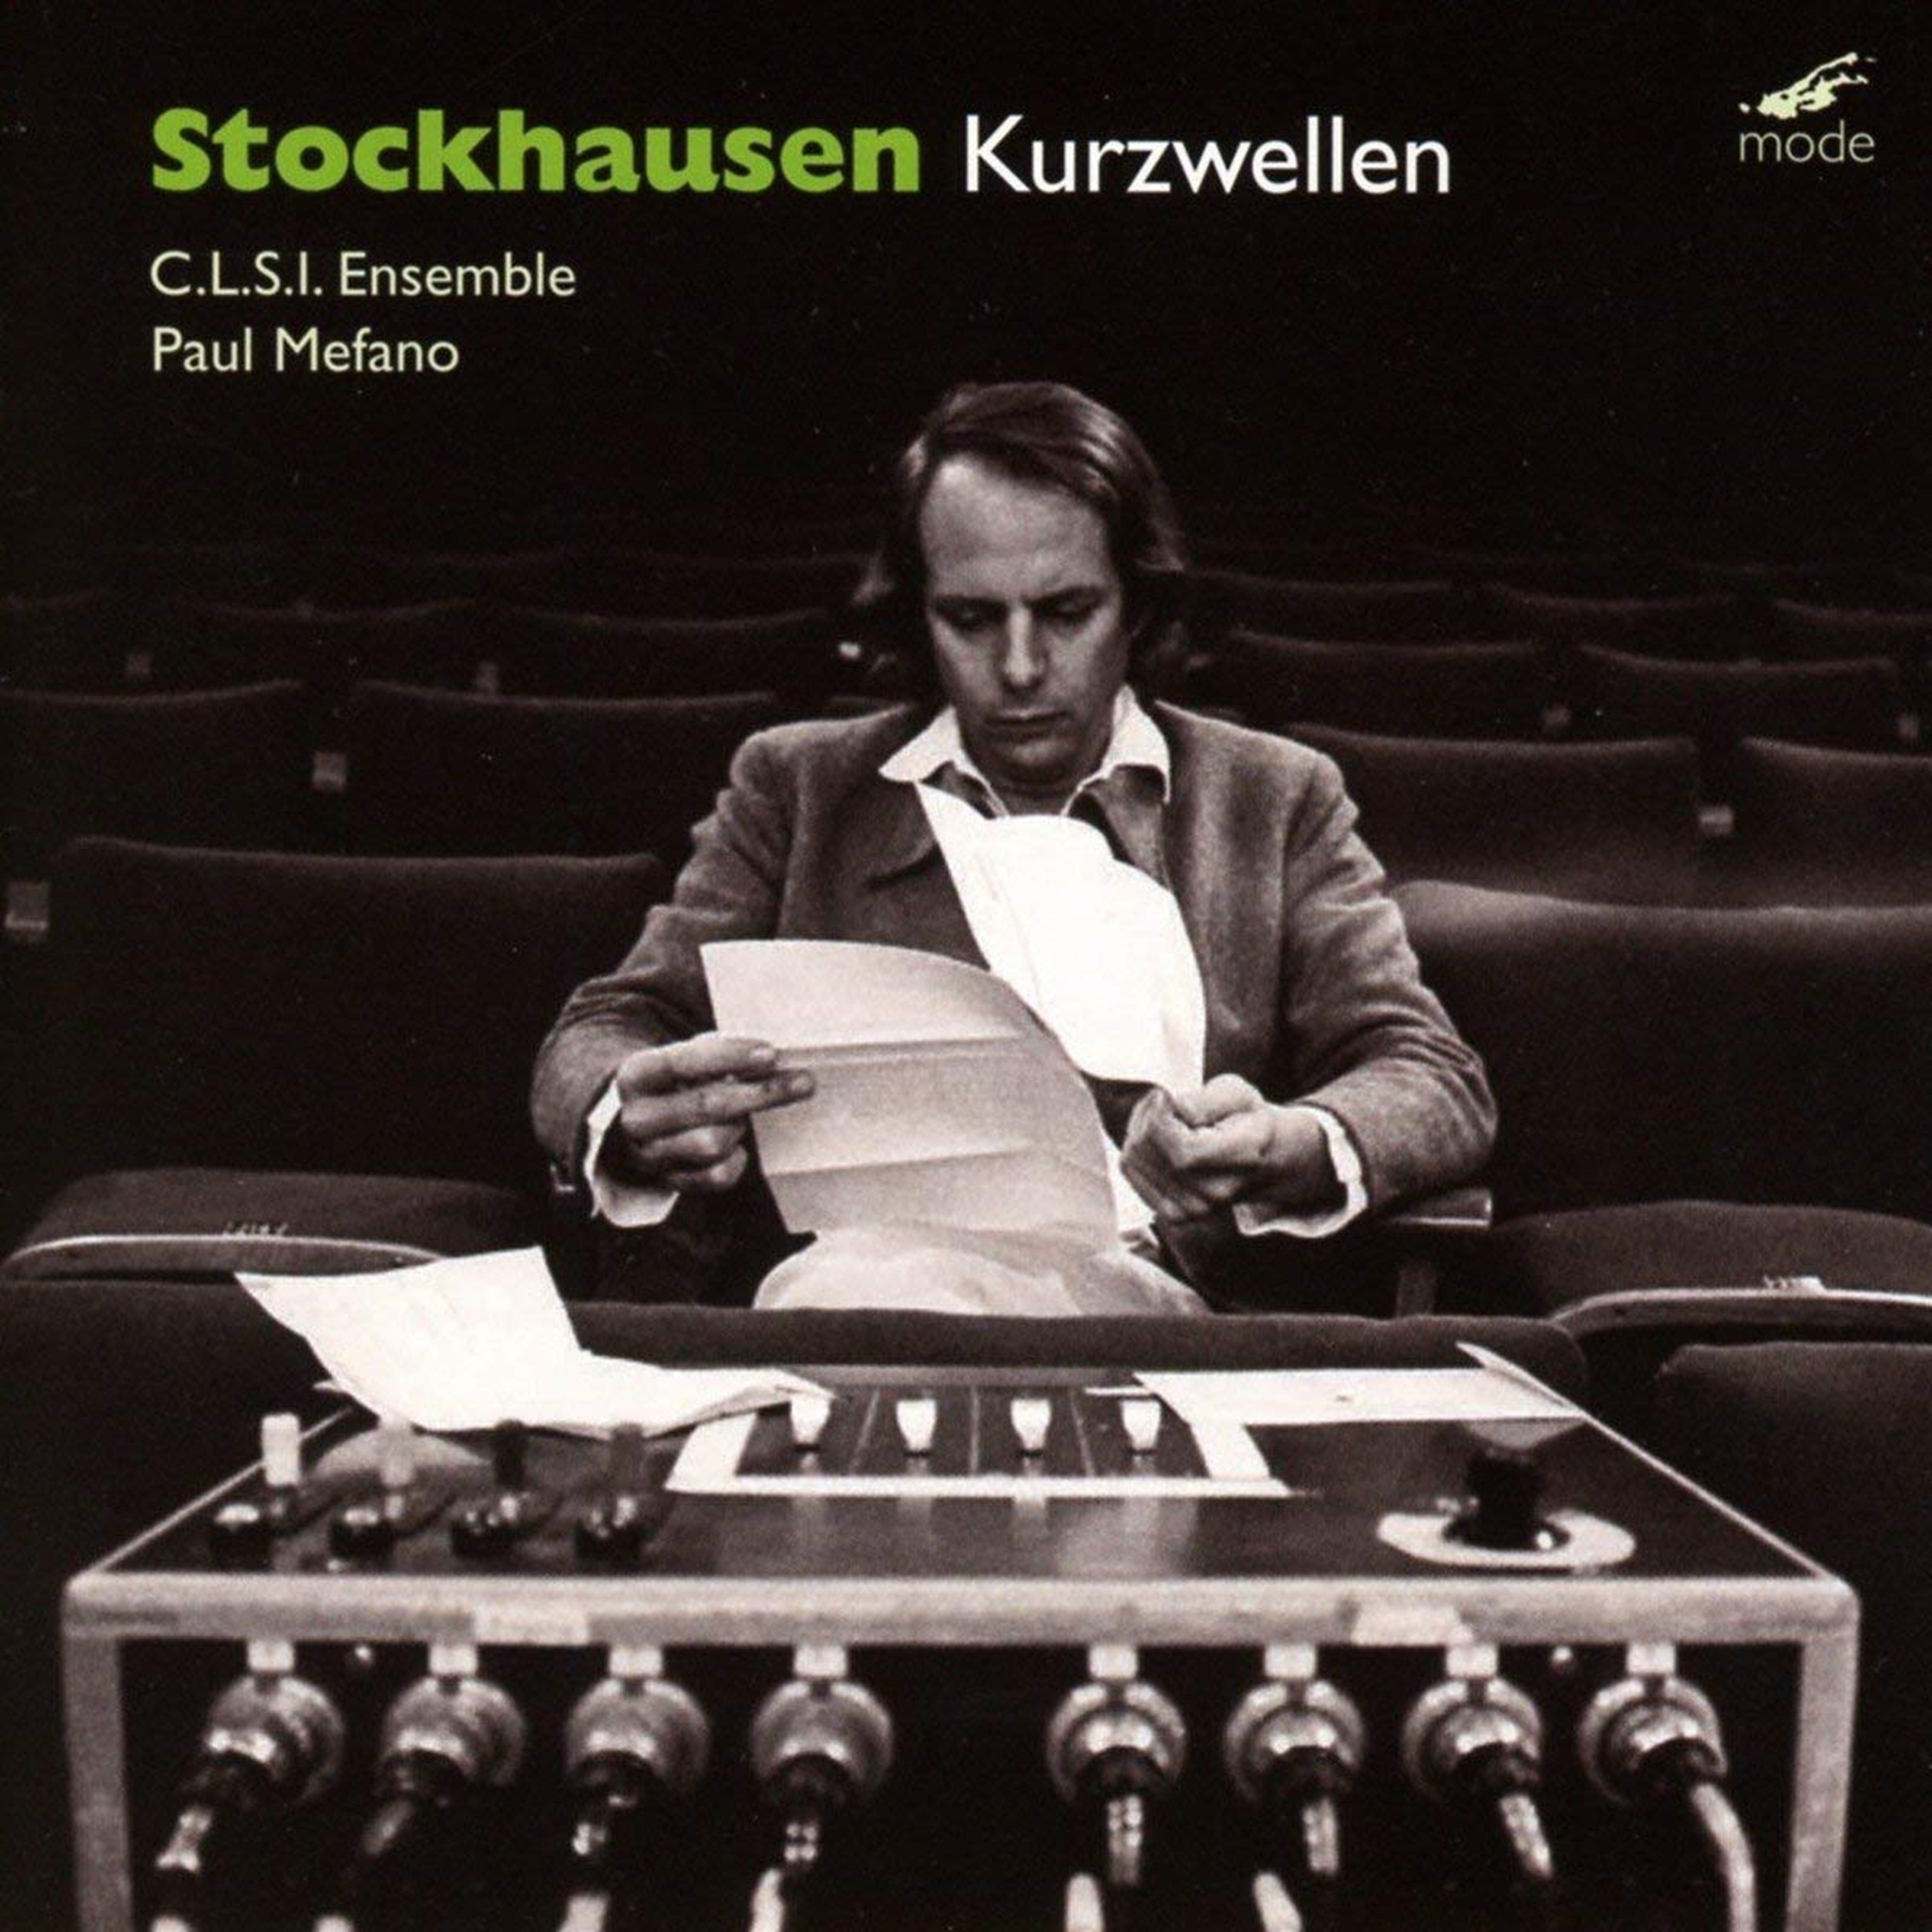 Stockhausen: Kurzwellen - 1